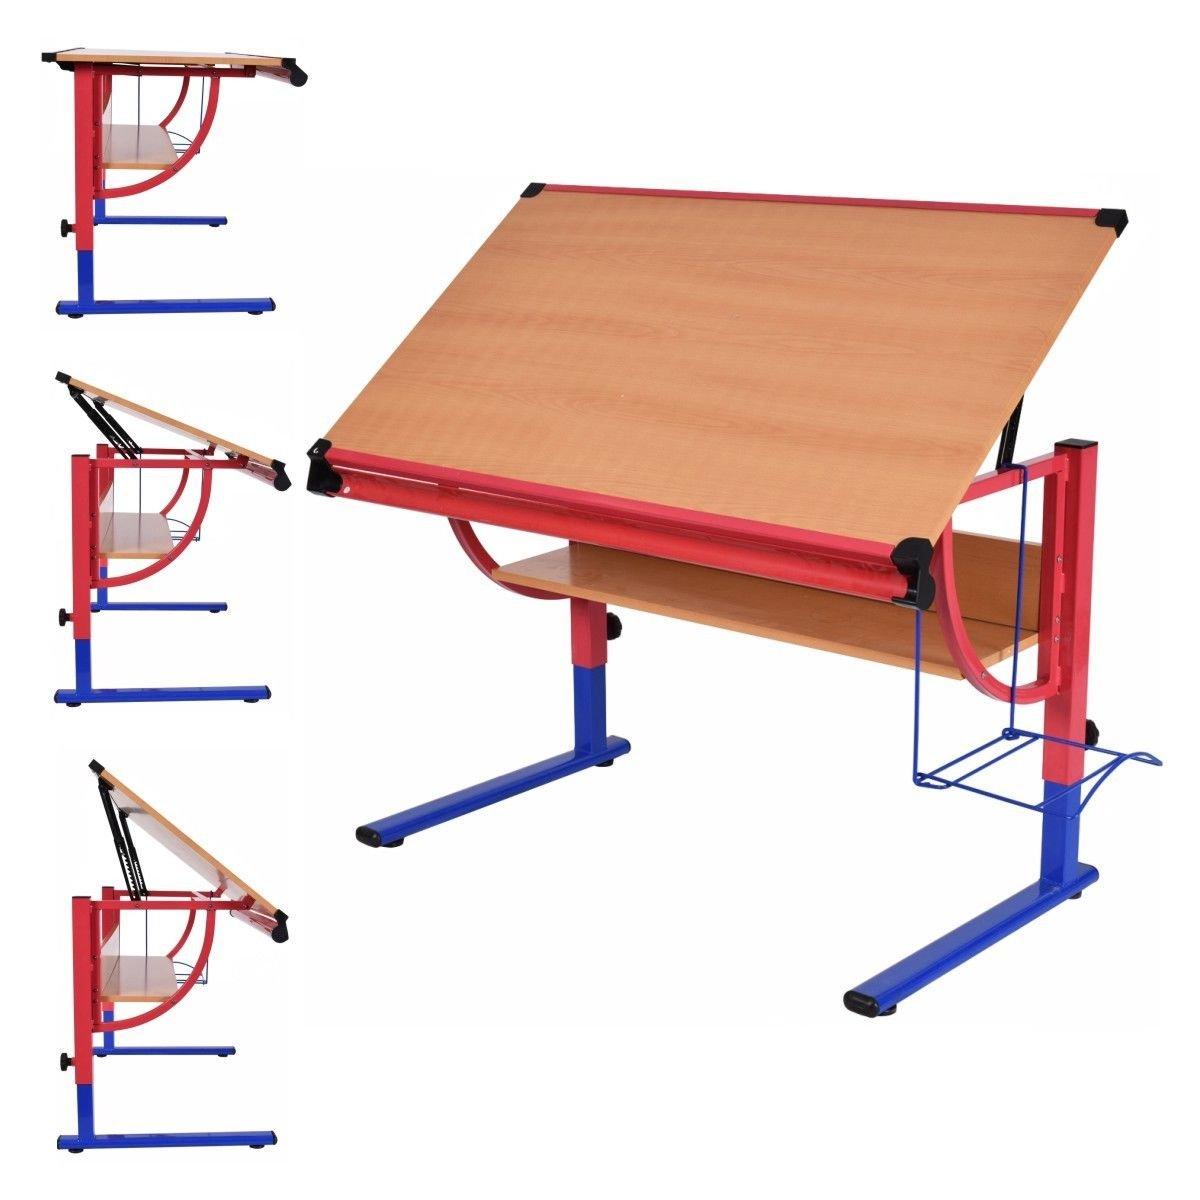 Amazon.com: Tangkula Drawing Desk Adjustable Drafting Table Art U0026 Craft  Hobby Studio Home Office Furniture